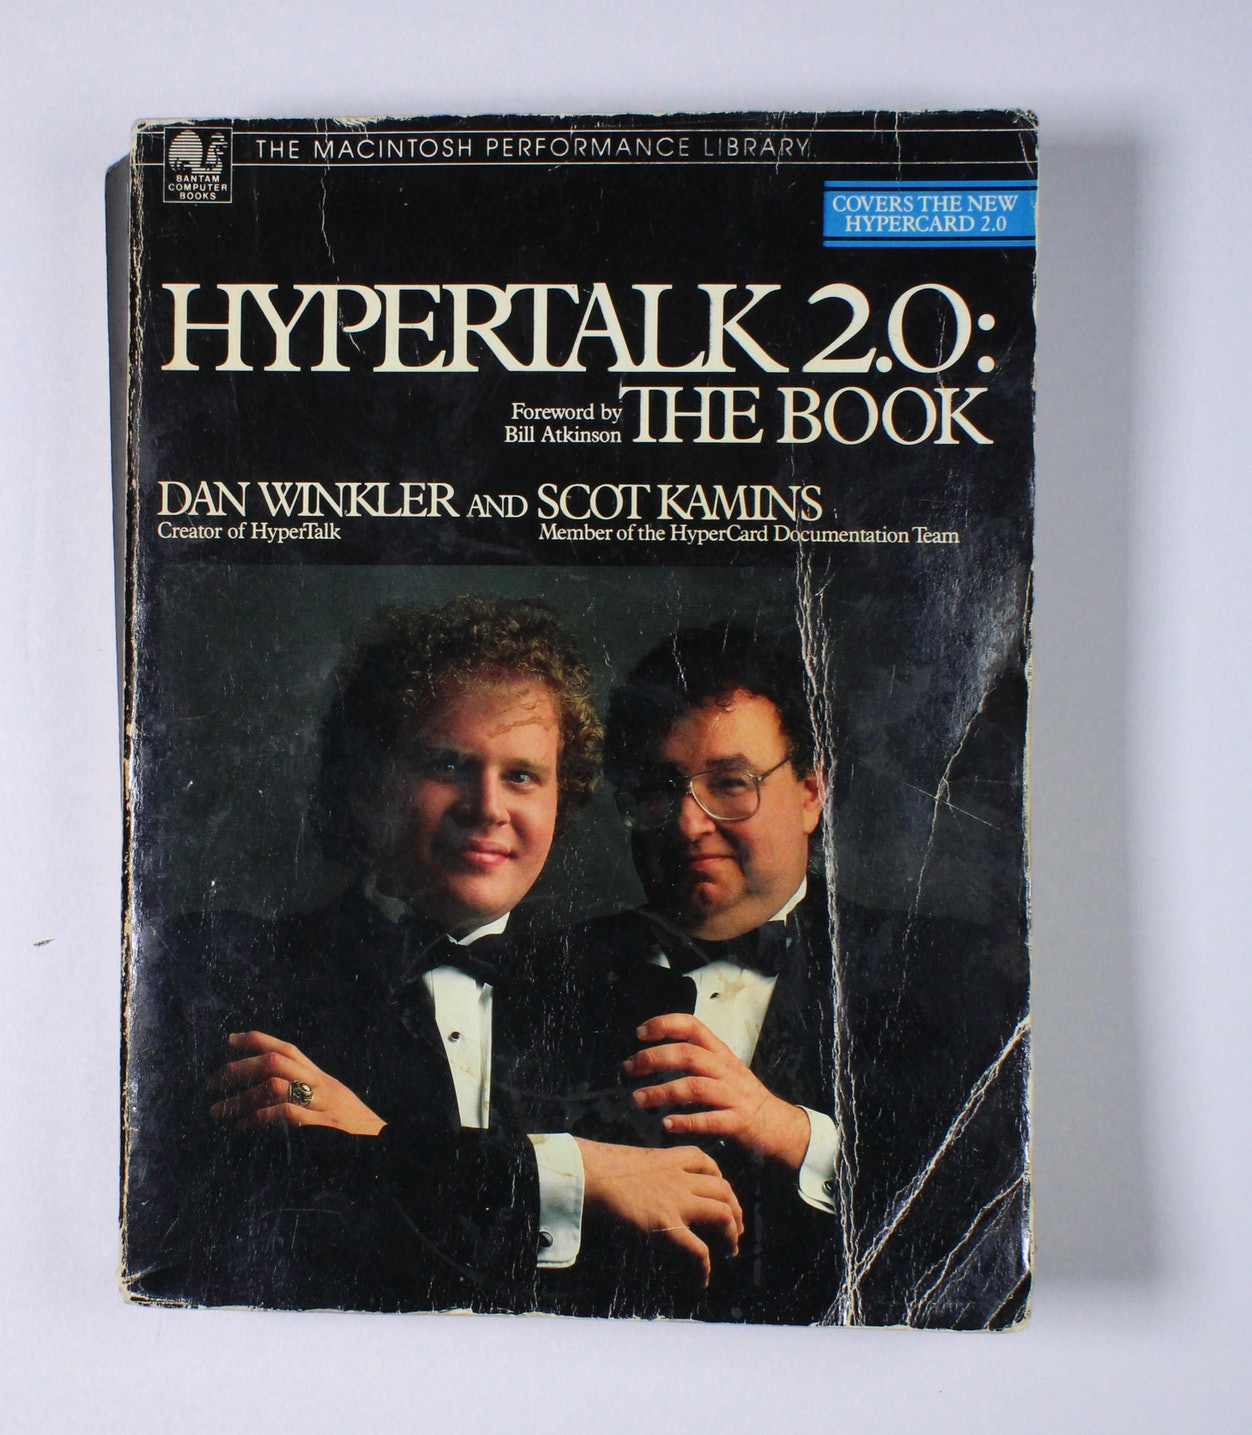 HyperTalk 2.0: The Book